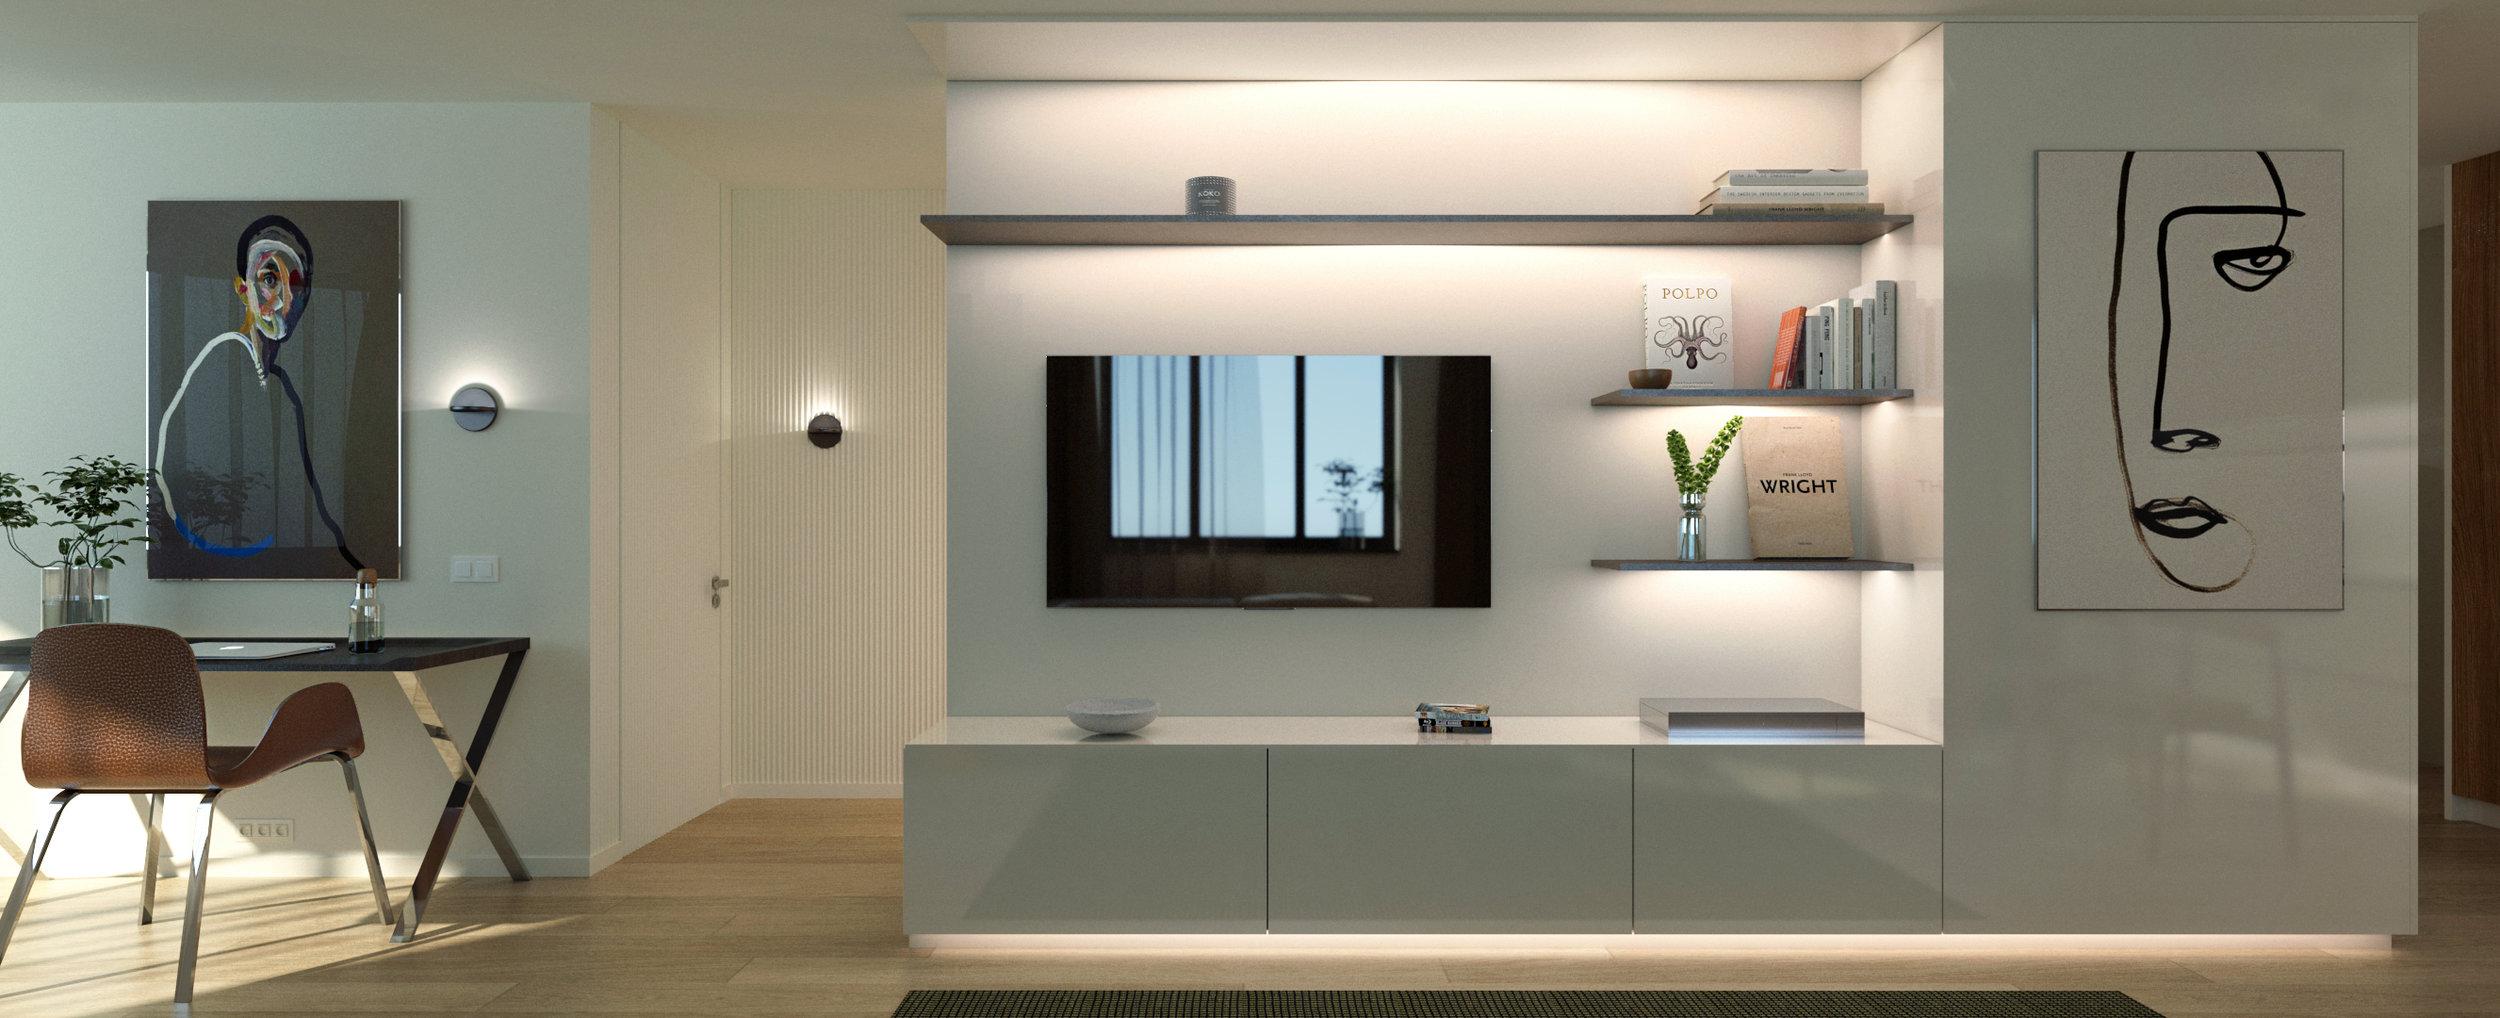 London_Apartment_Gila_Shemie_Zakay_Bre (7).jpg